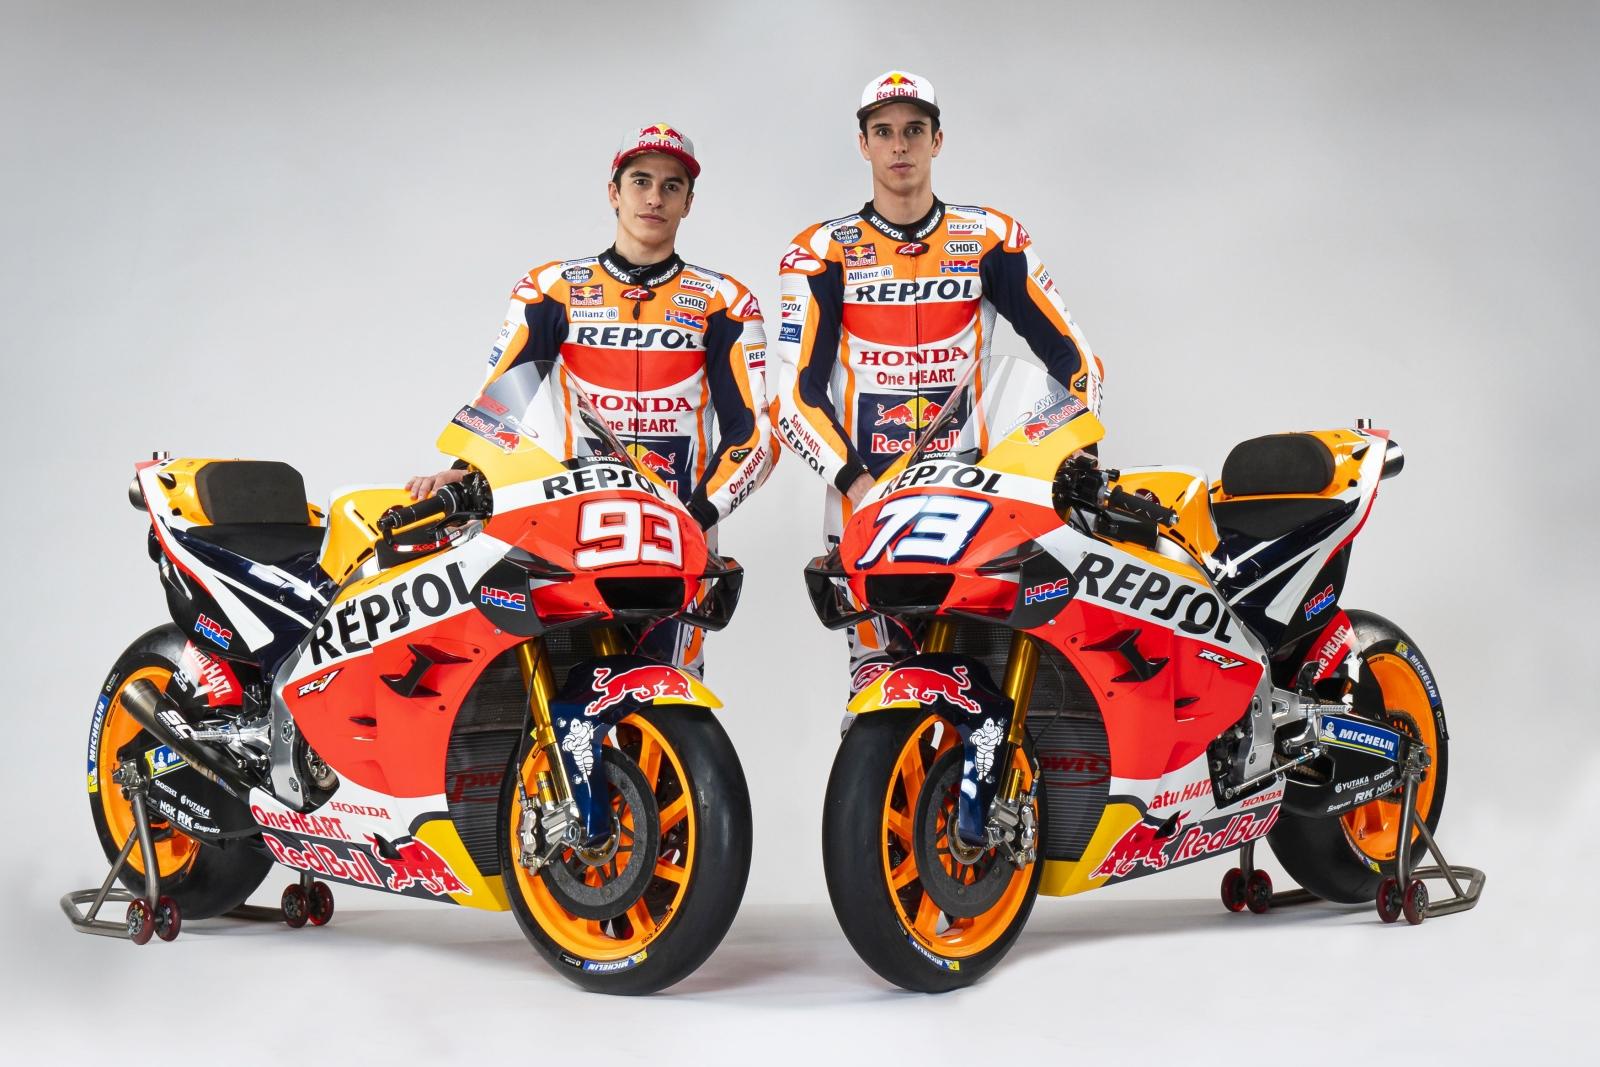 La Honda RC213V de Marc Márquez y Álex Márquez para MotoGP 2020